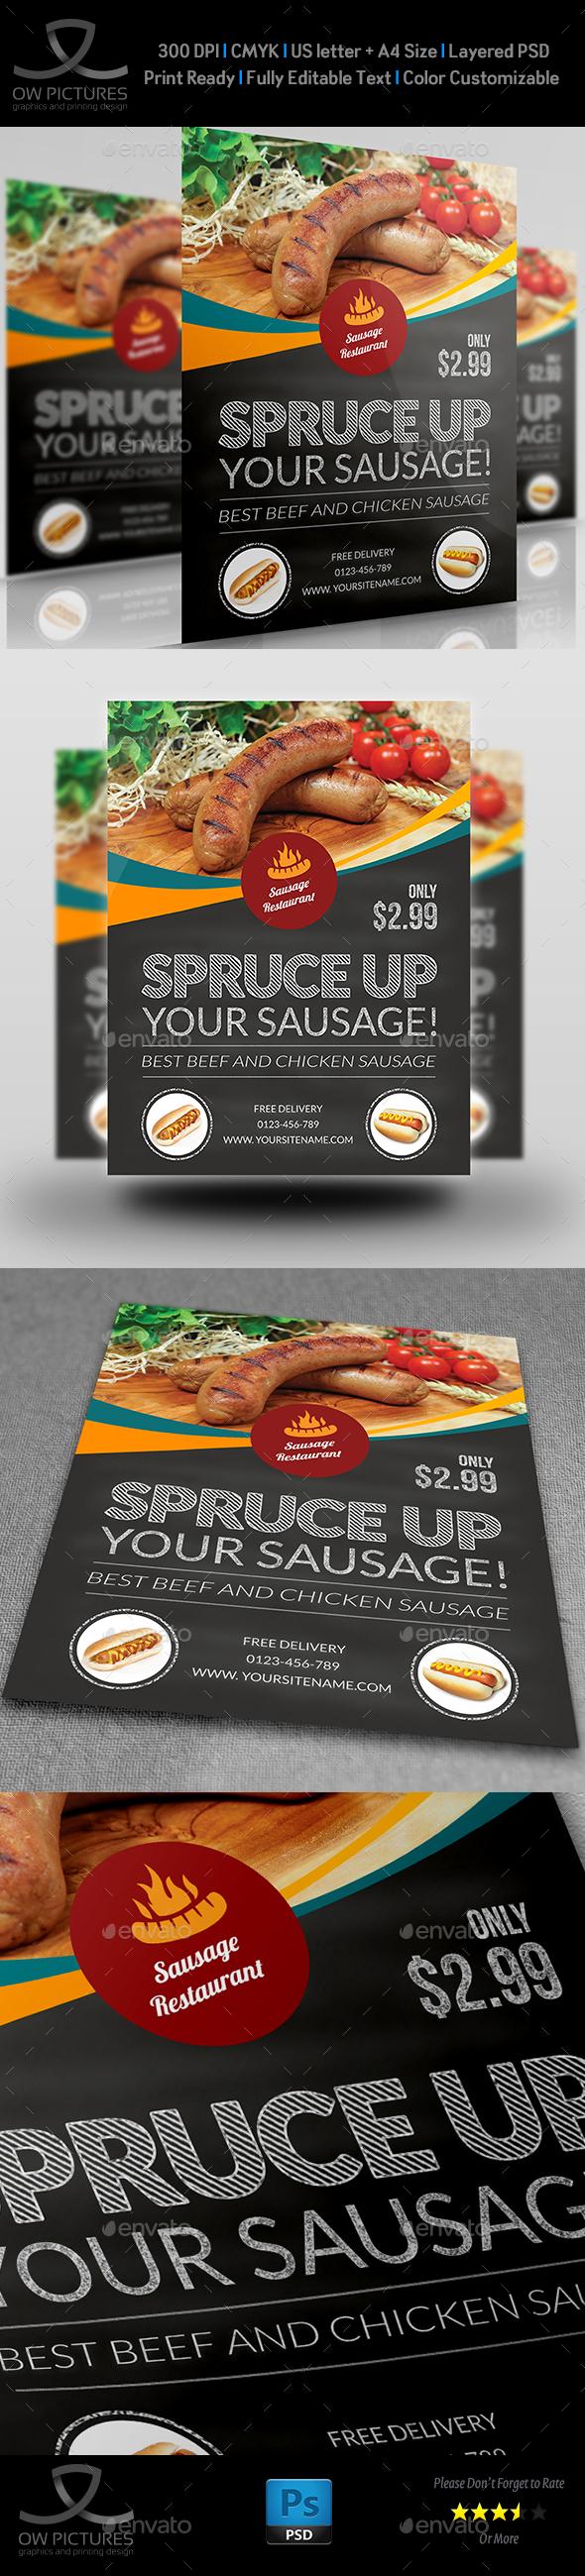 Sausage Restaurant Flyer Template